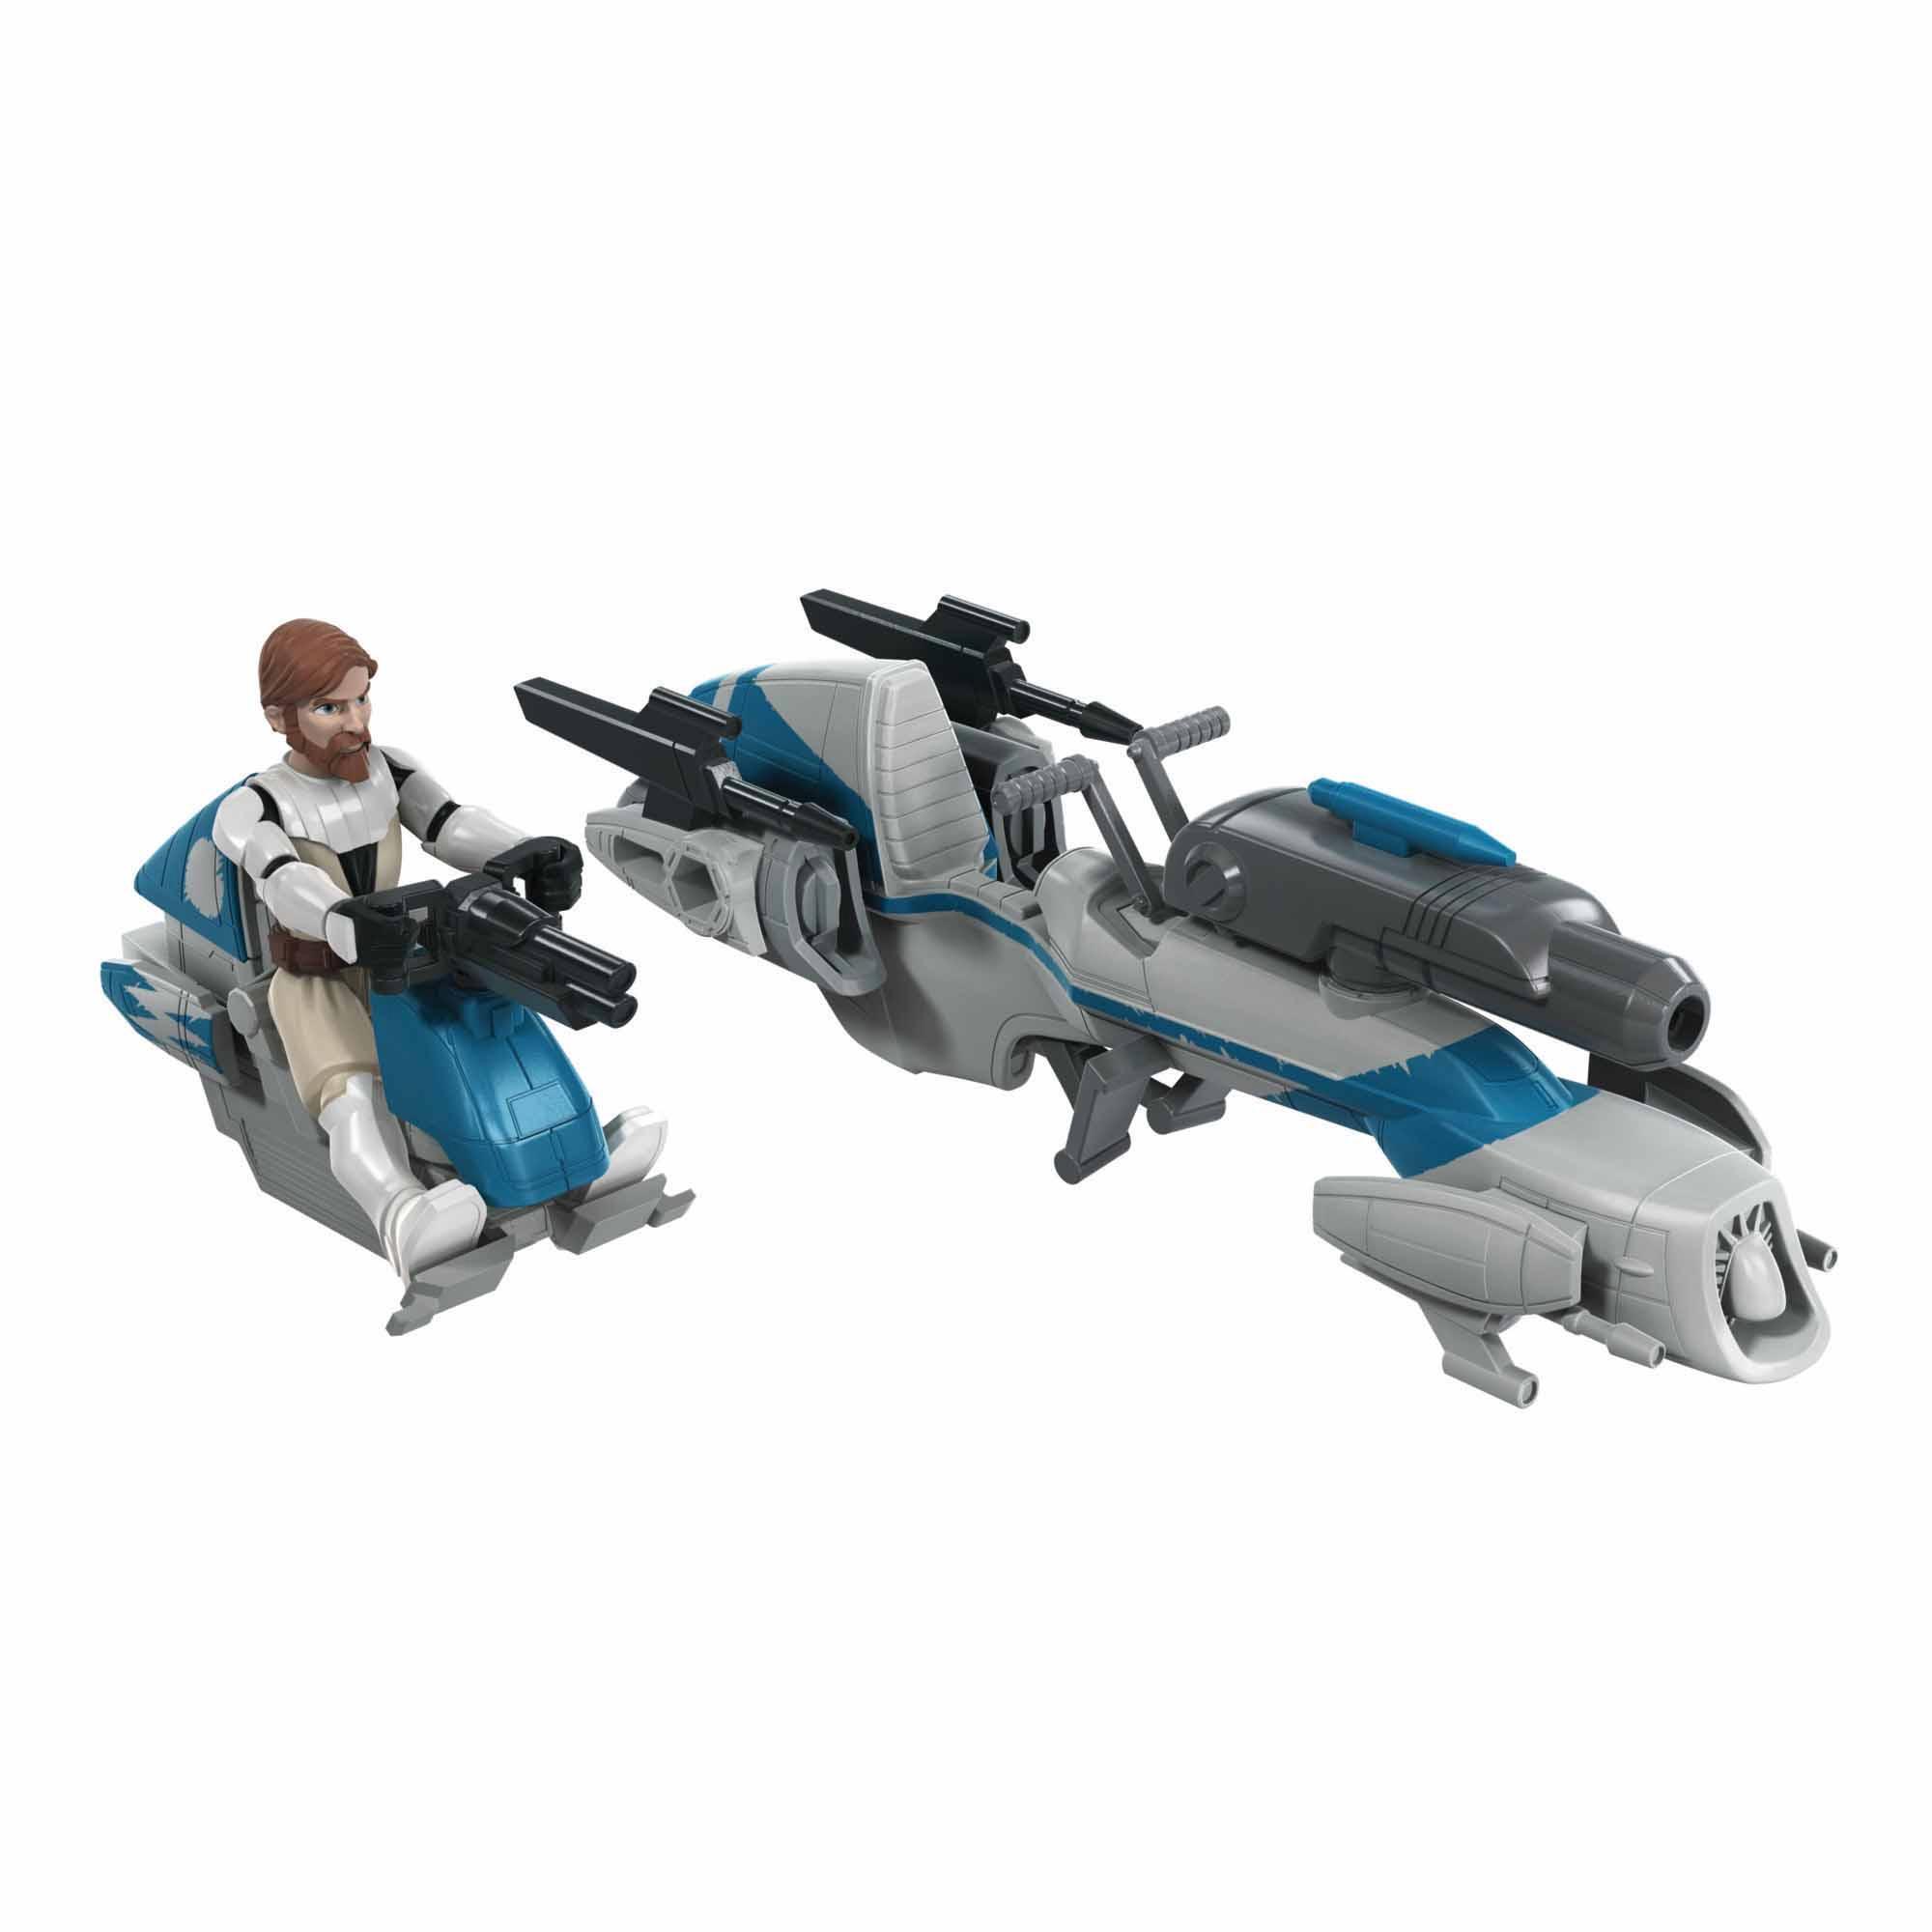 Star Wars Mission Fleet Expedition Class Obi-Wan Kenobi Jedi Speeder Chase 2.5-Inch-Scale Figure and Vehicle